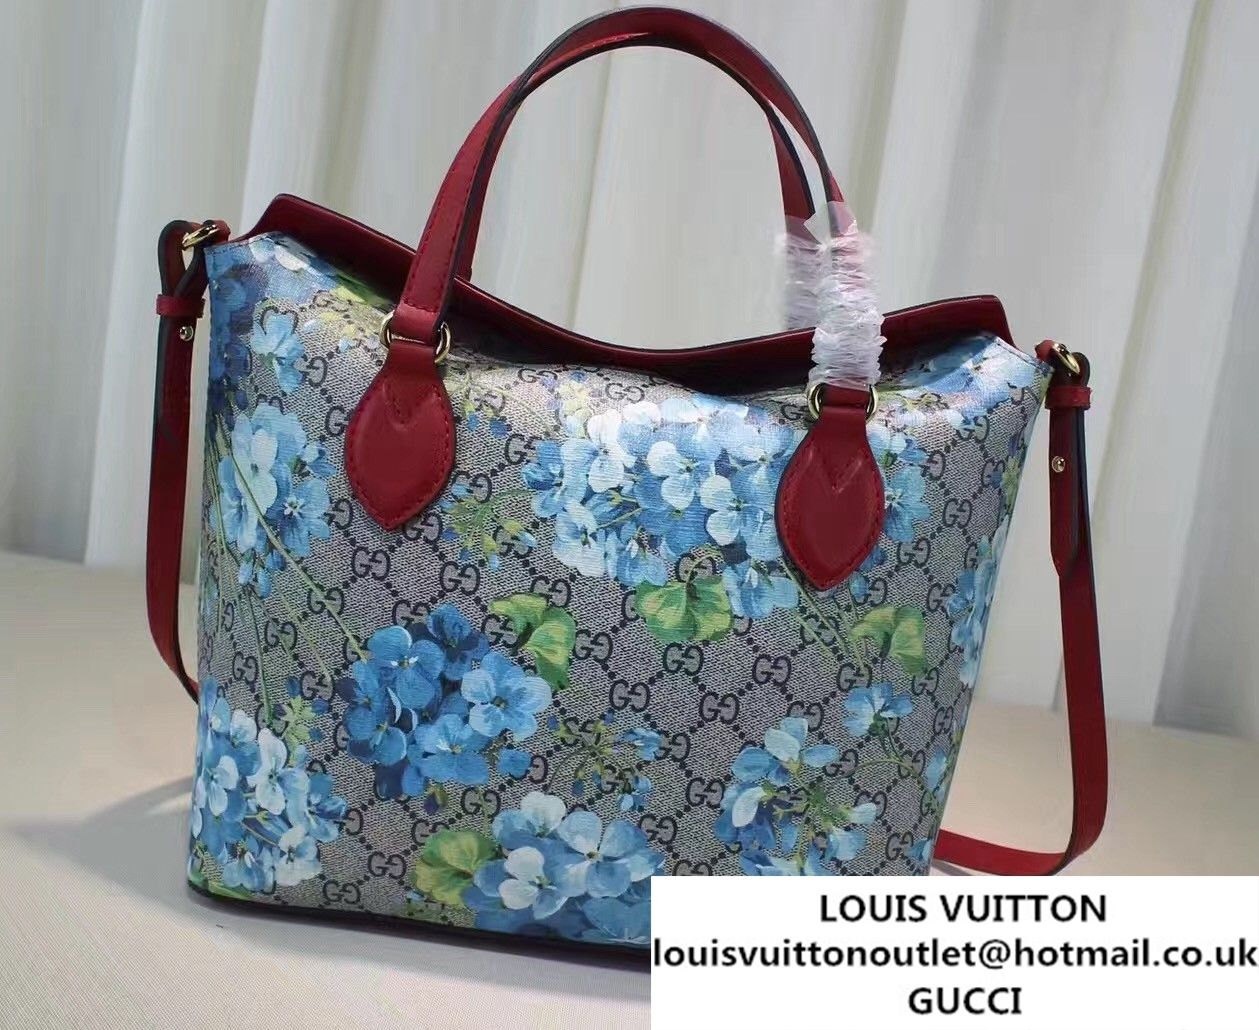 03855812681c Gucci GG Supreme Small Top Handle Tote Bag 429147 Blooms Blue ...